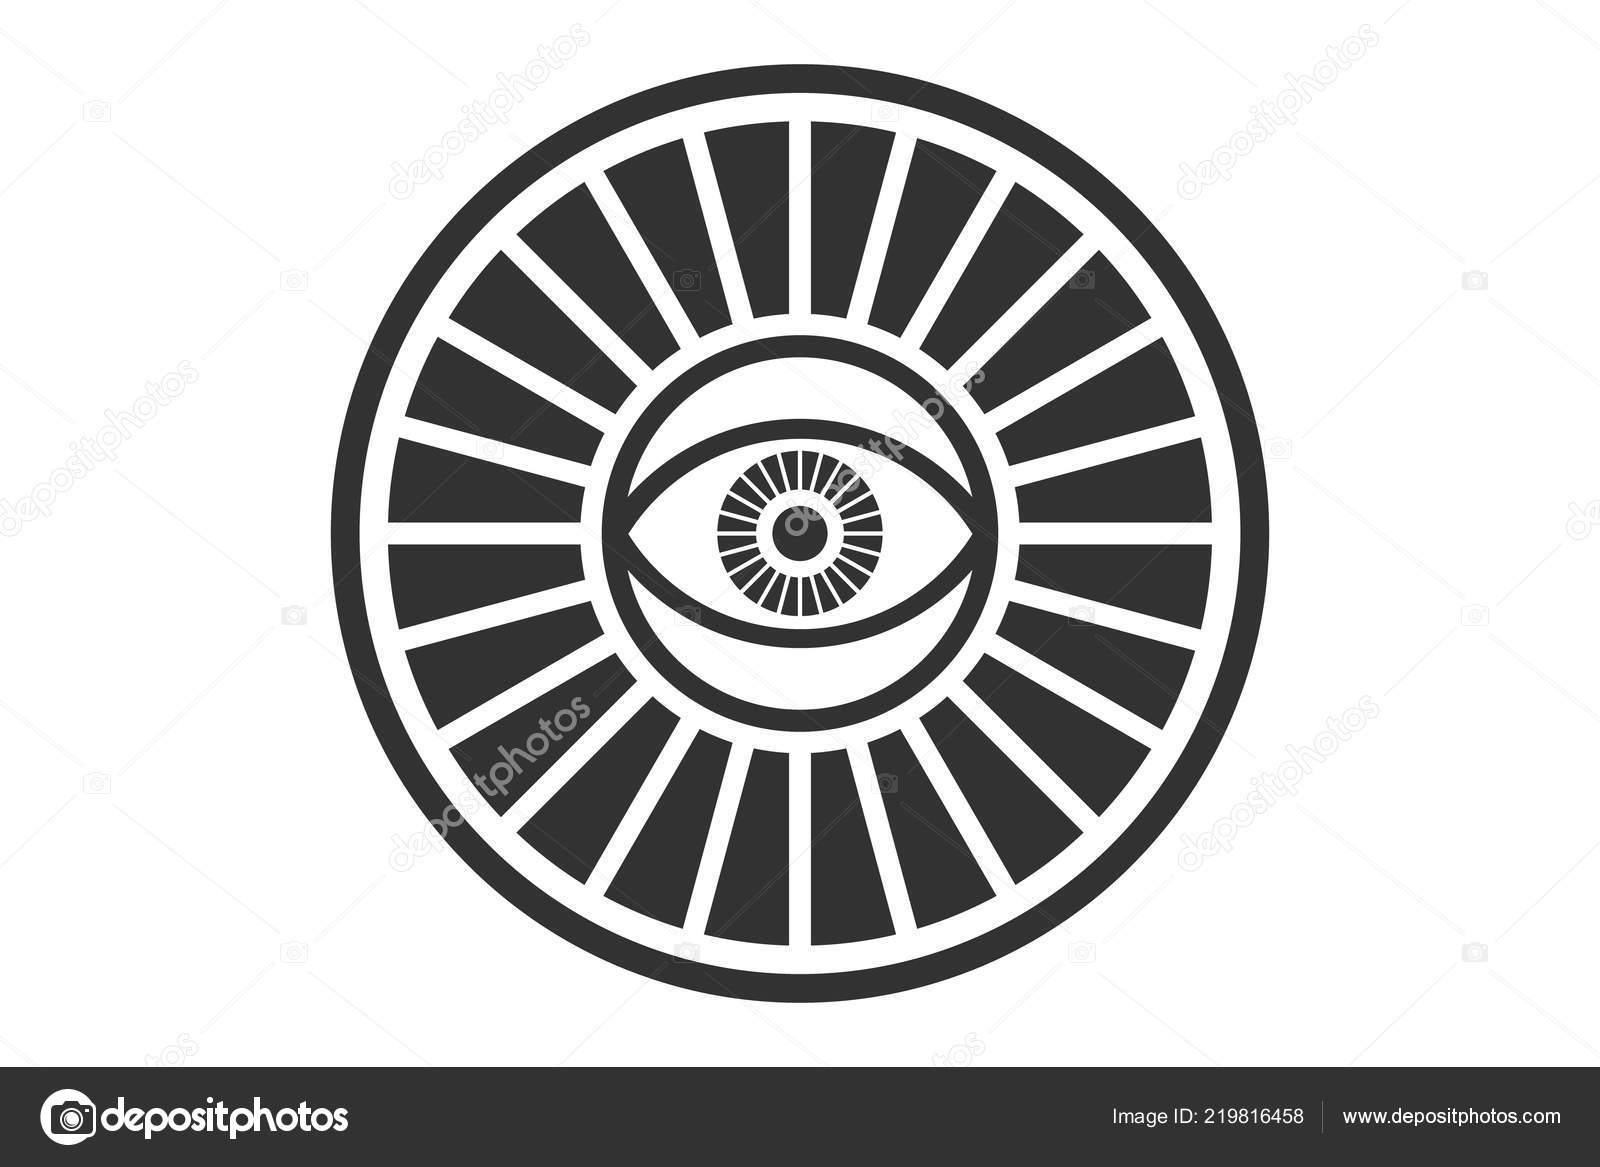 new world order eye providence conspiracy theory masonic esoteric